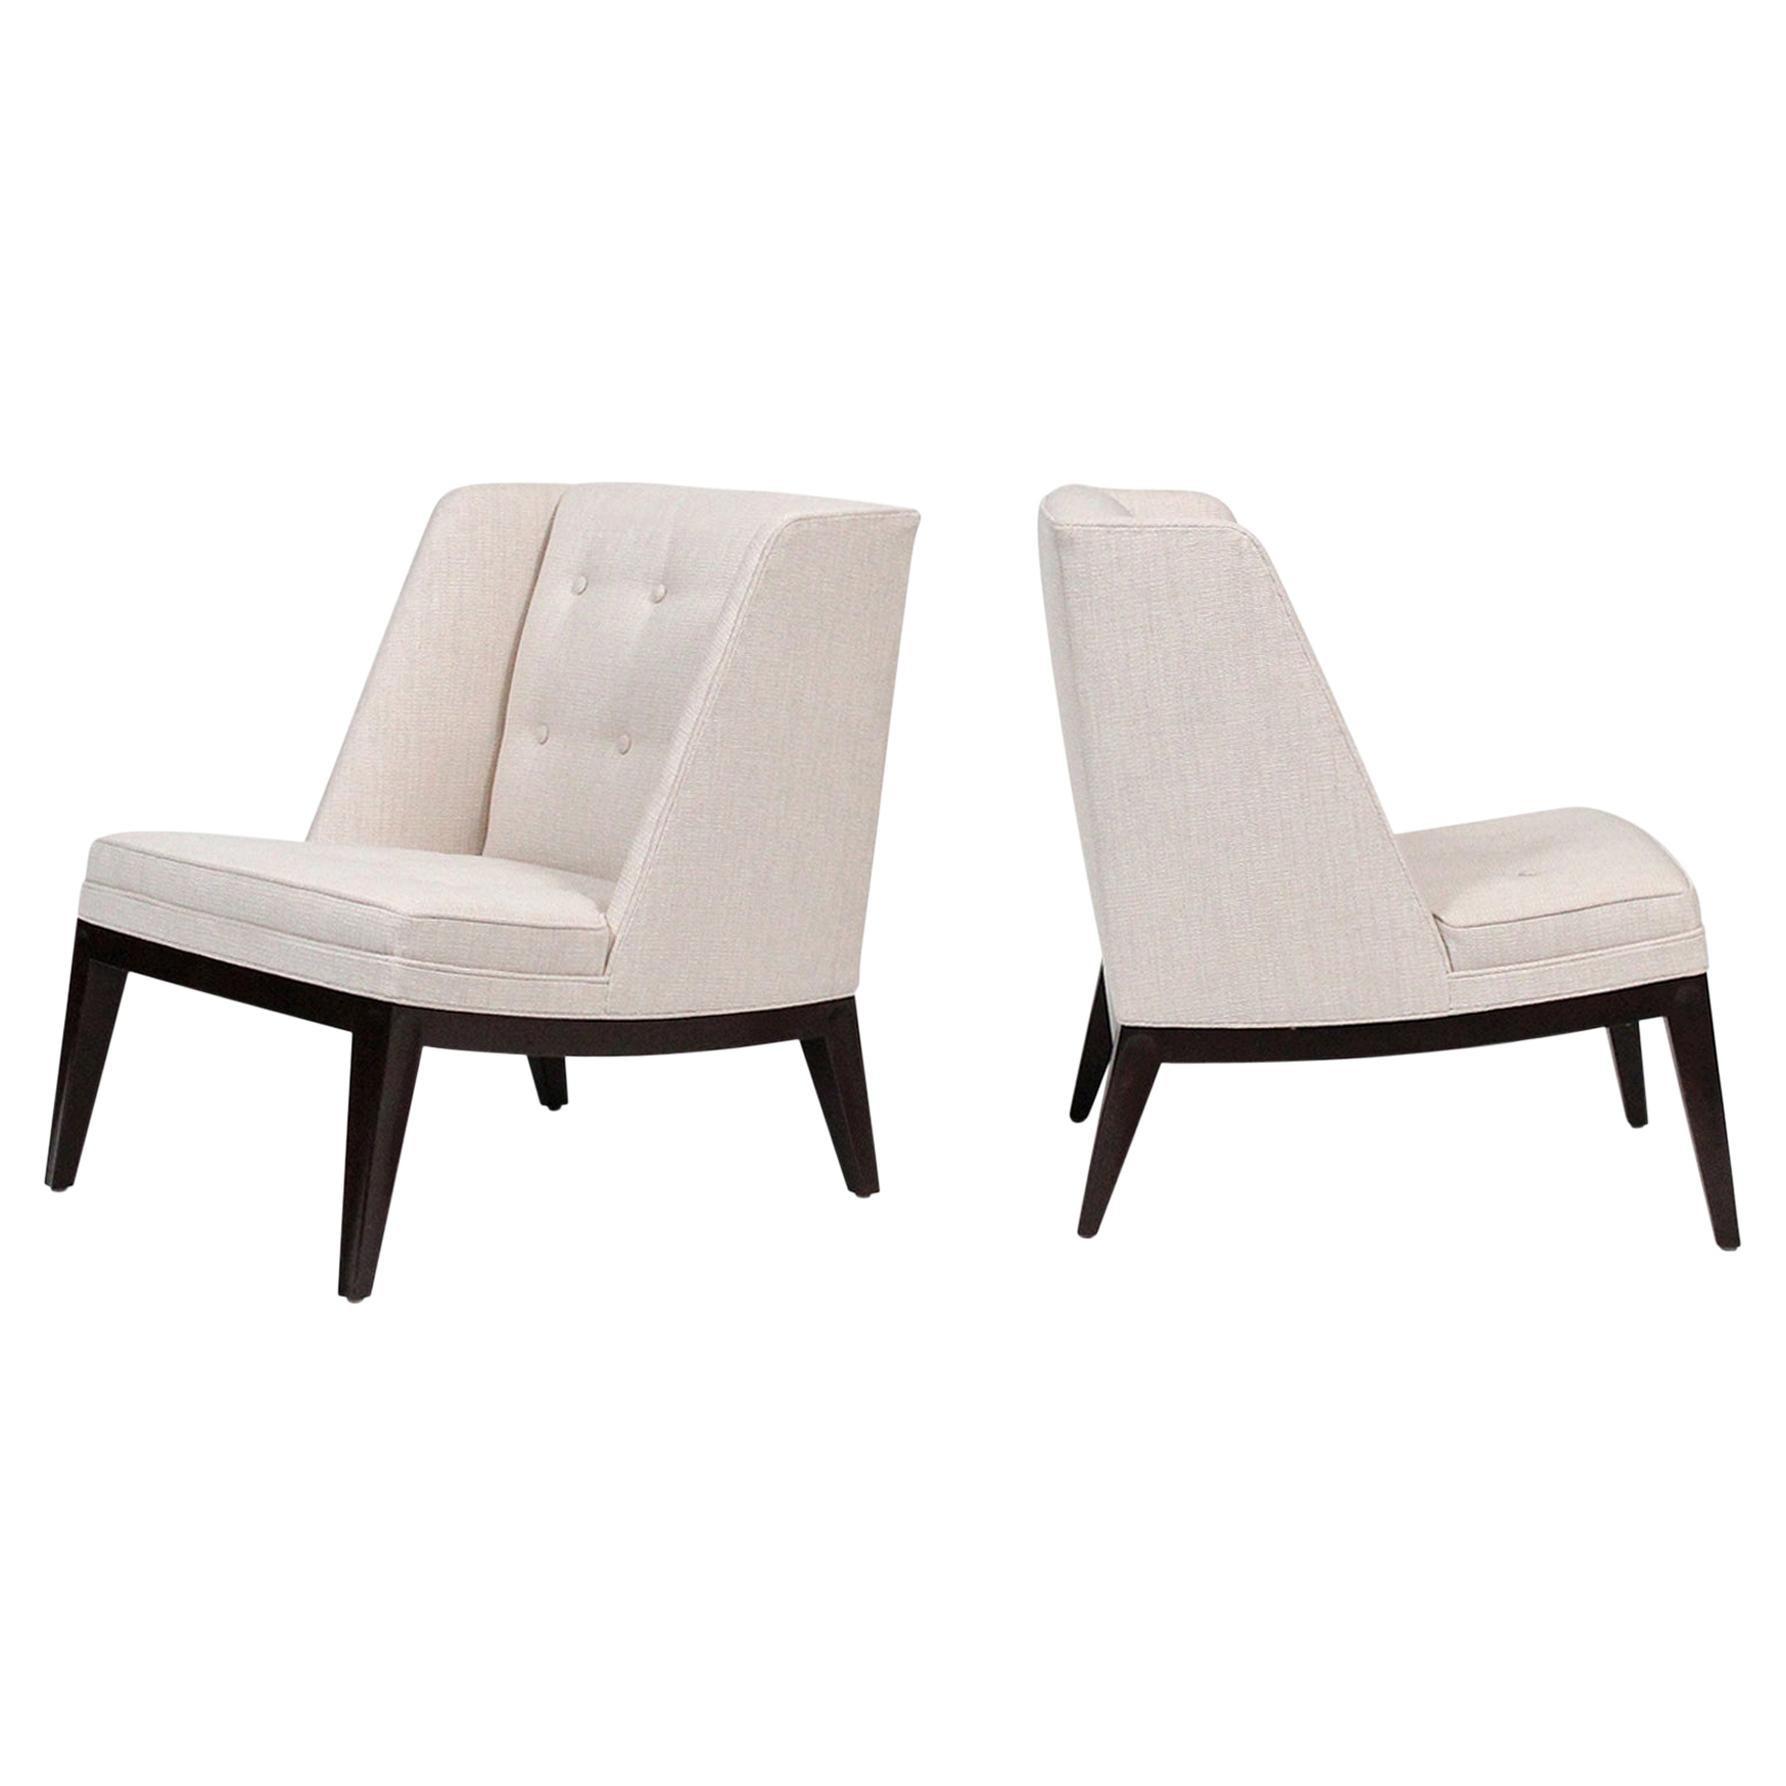 Edward Wormley for Dunbar Lounge Chairs